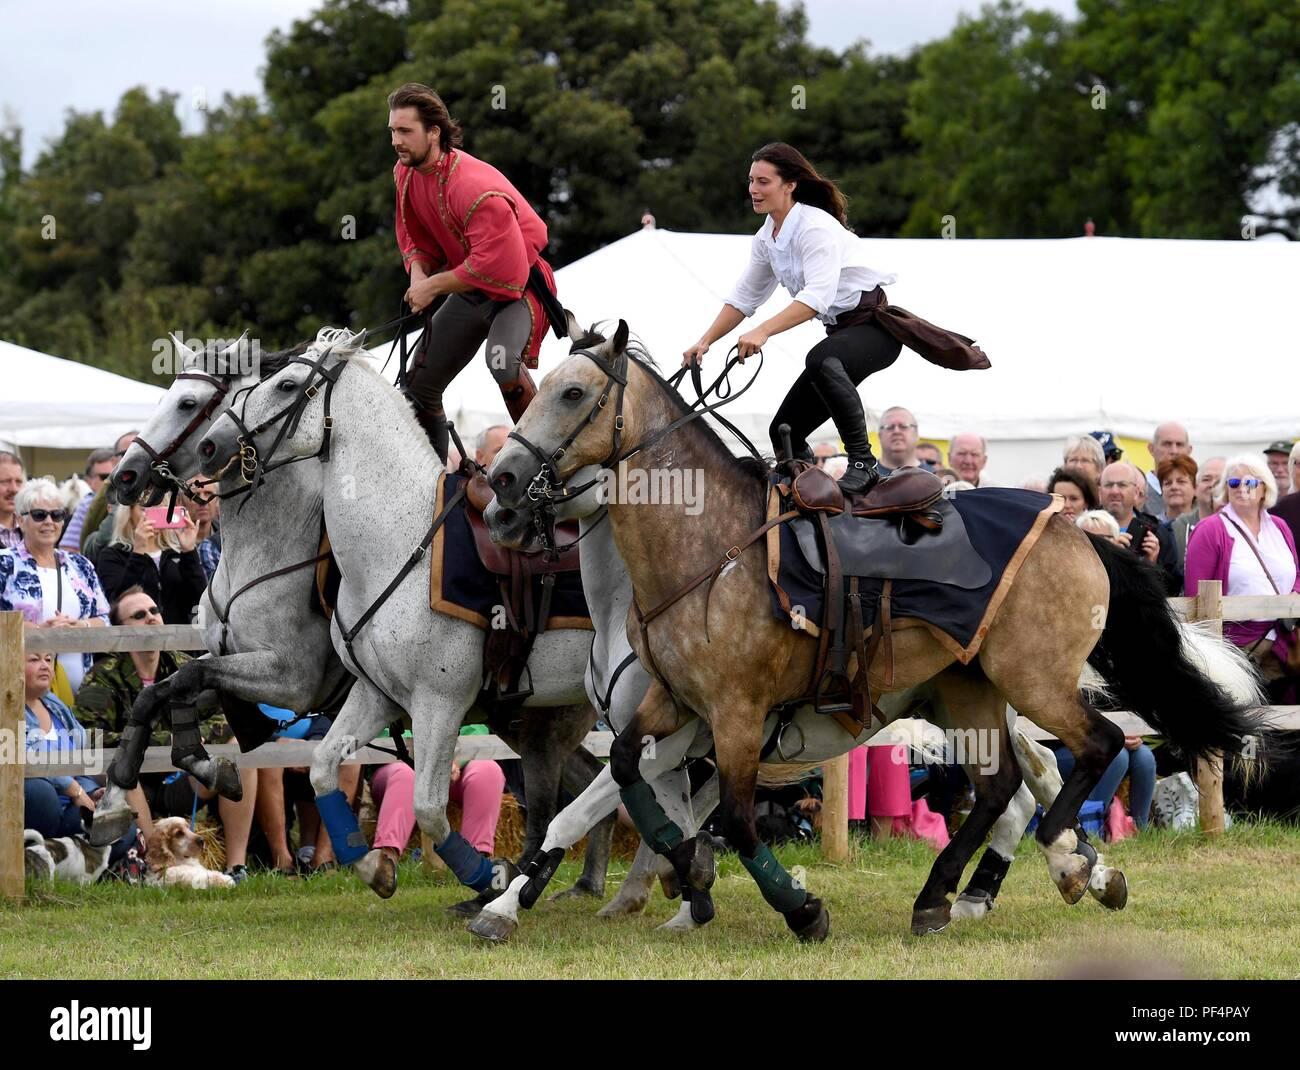 The Devil's Horsemen perform at Buckham Fair, Dorset, UK Credit: Finnbarr Webster/Alamy Live News - Stock Image